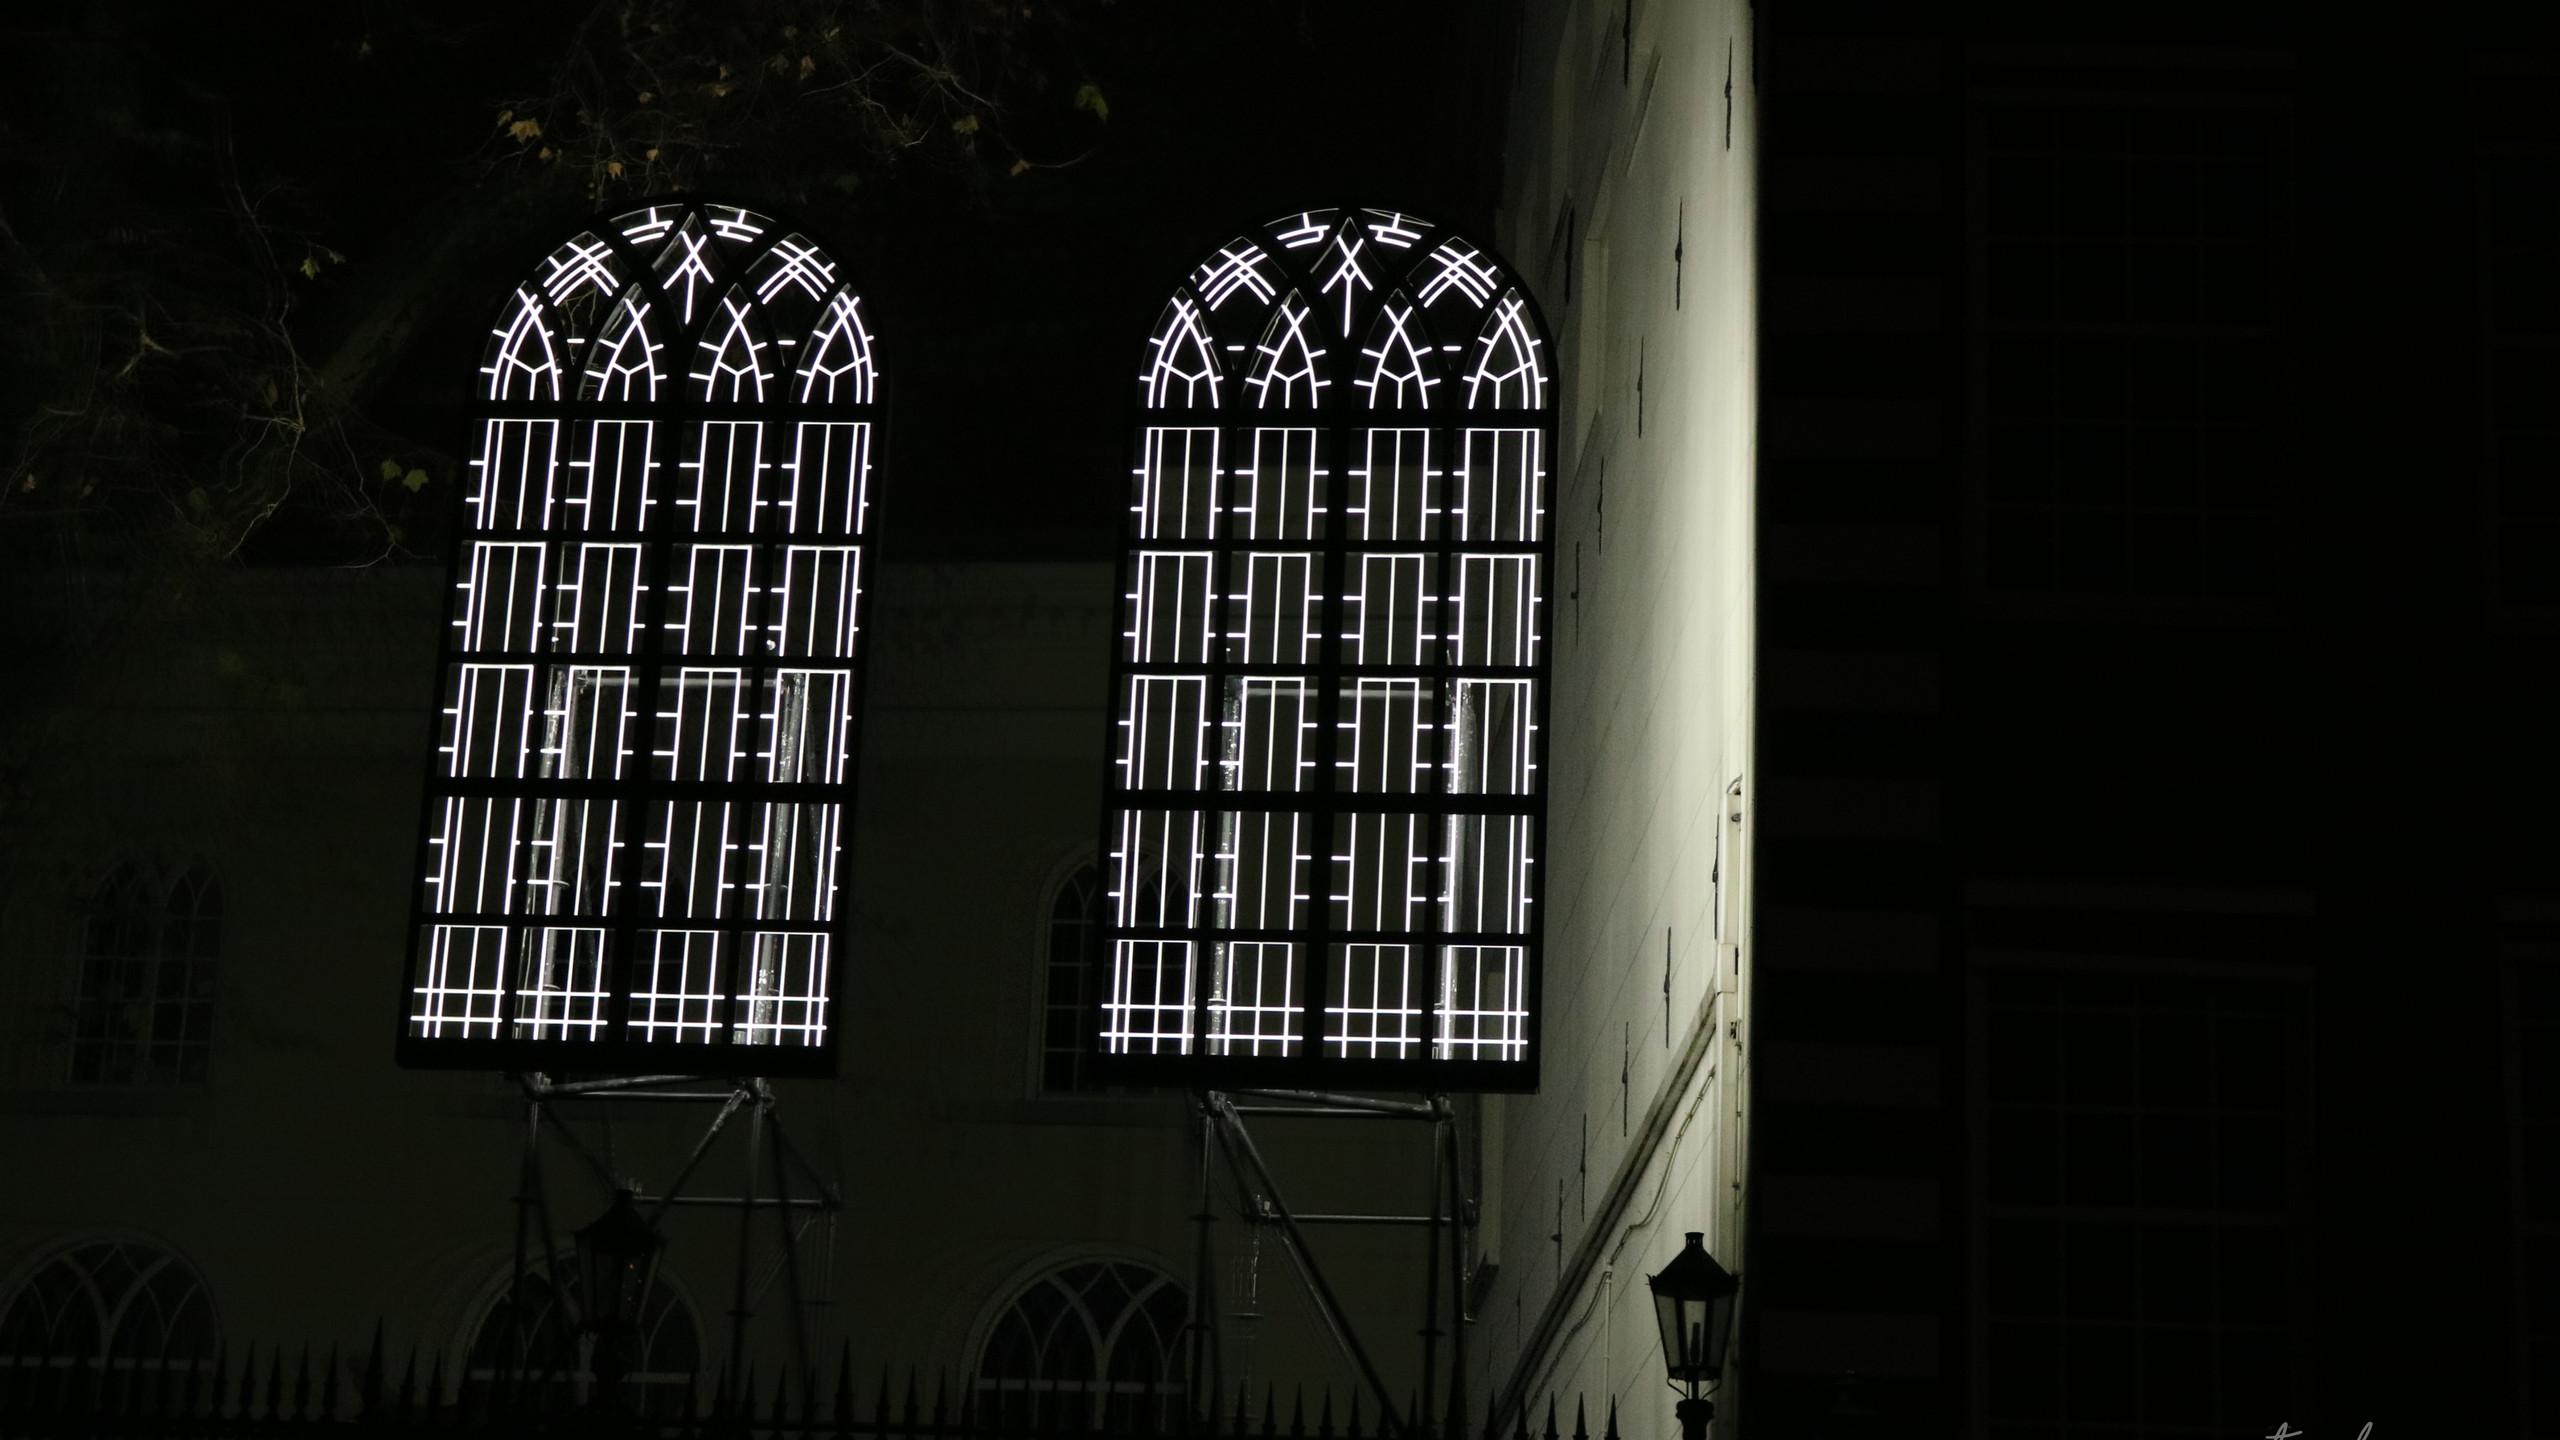 The eyes of hidden churches - Lynne Leegtes